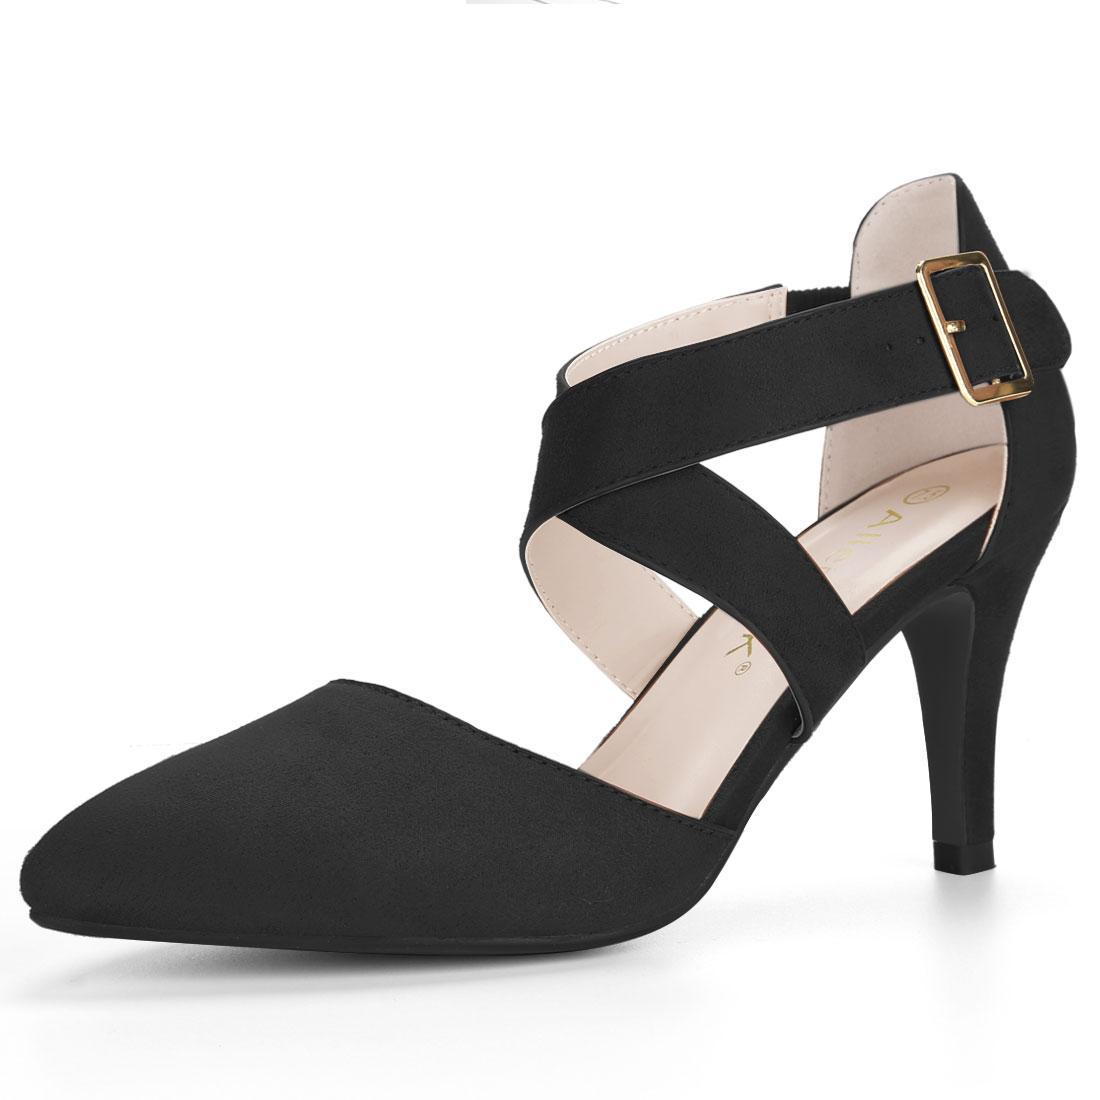 Allegra K Women's Crisscross Straps Stiletto Heel Ankle Strap Pumps Black US 9.5